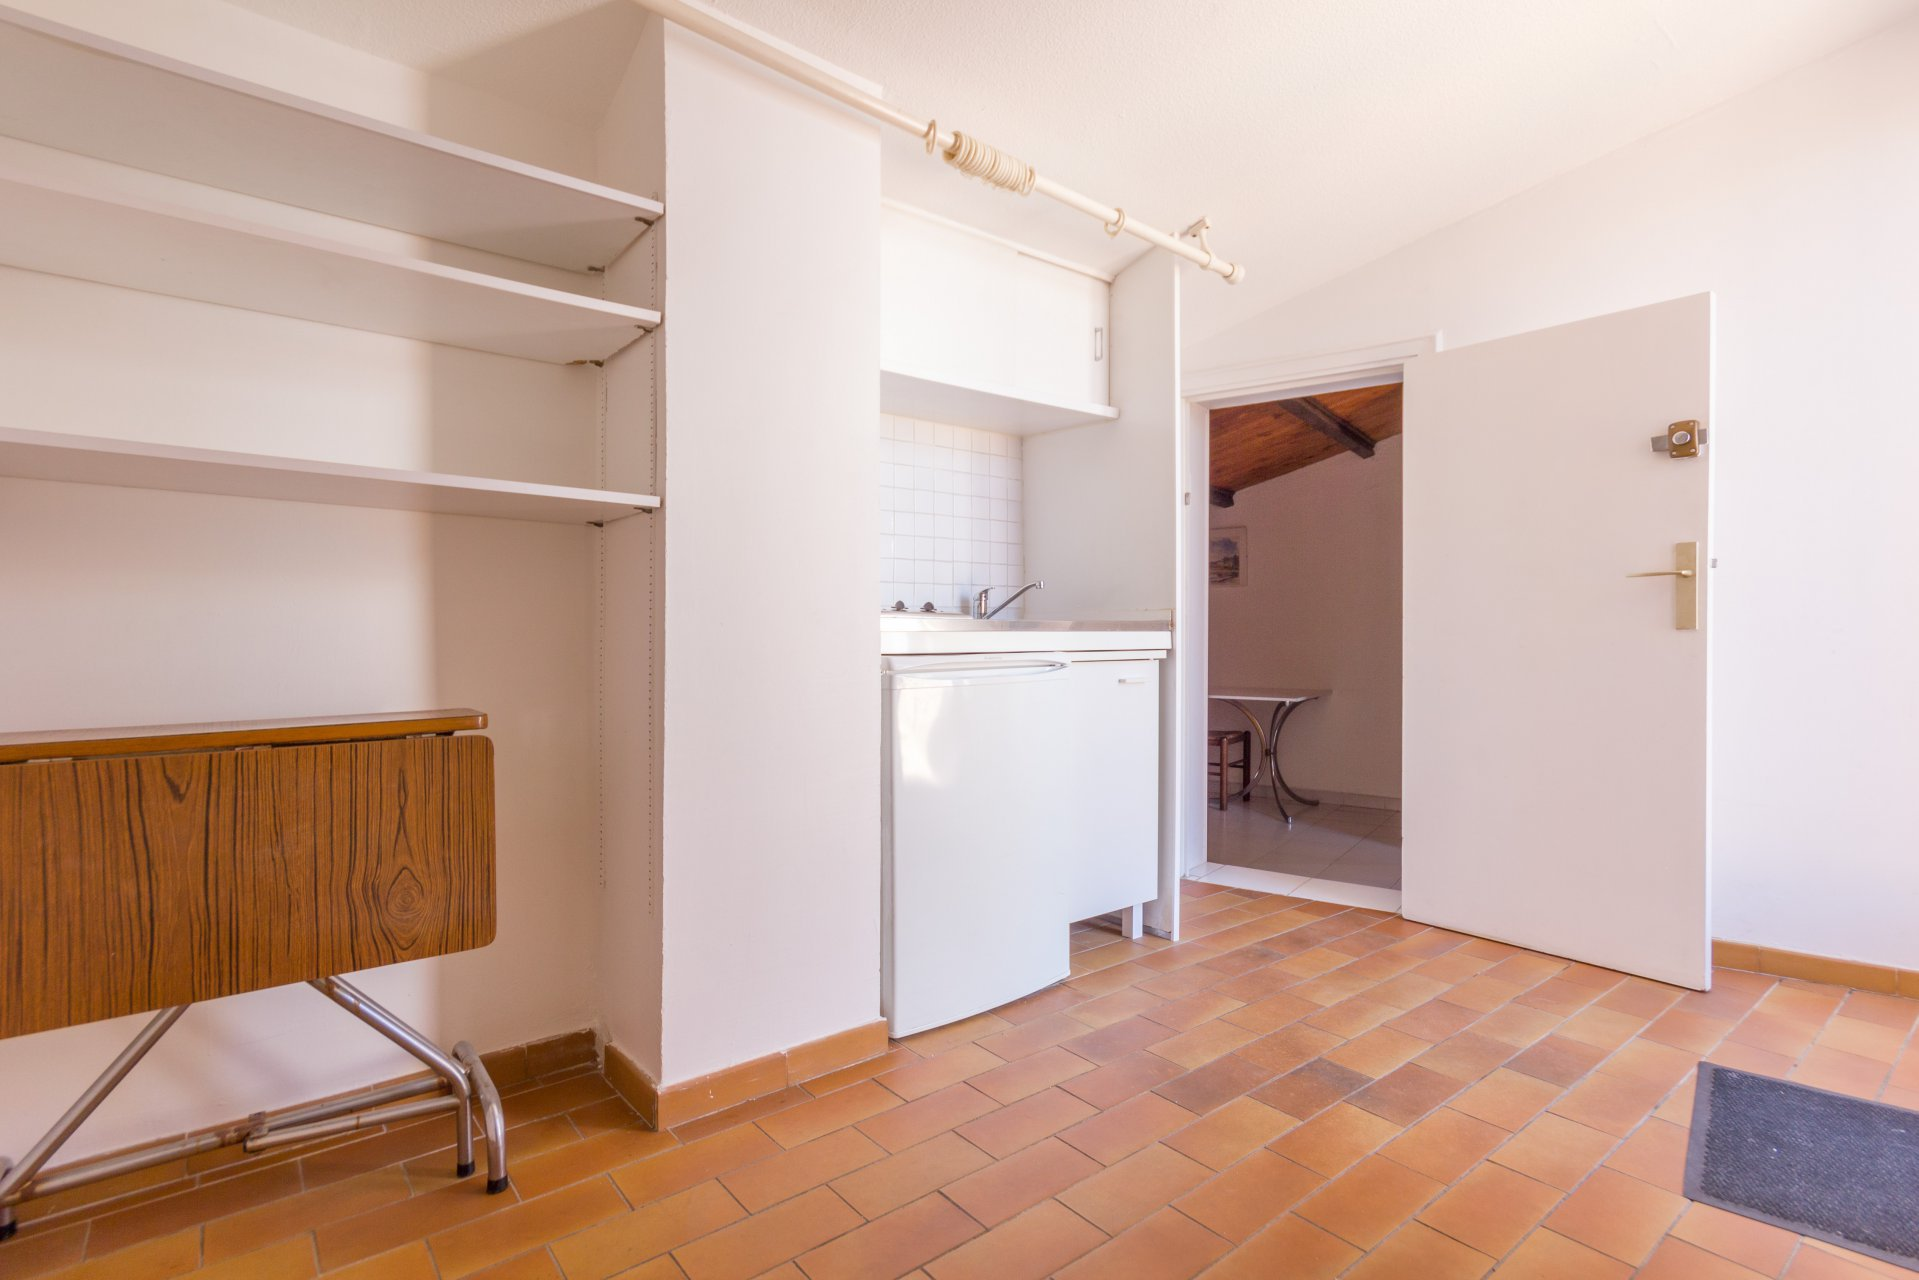 NICE - LANTERNE - Appartement 4/5 pièces en duplex terrasse